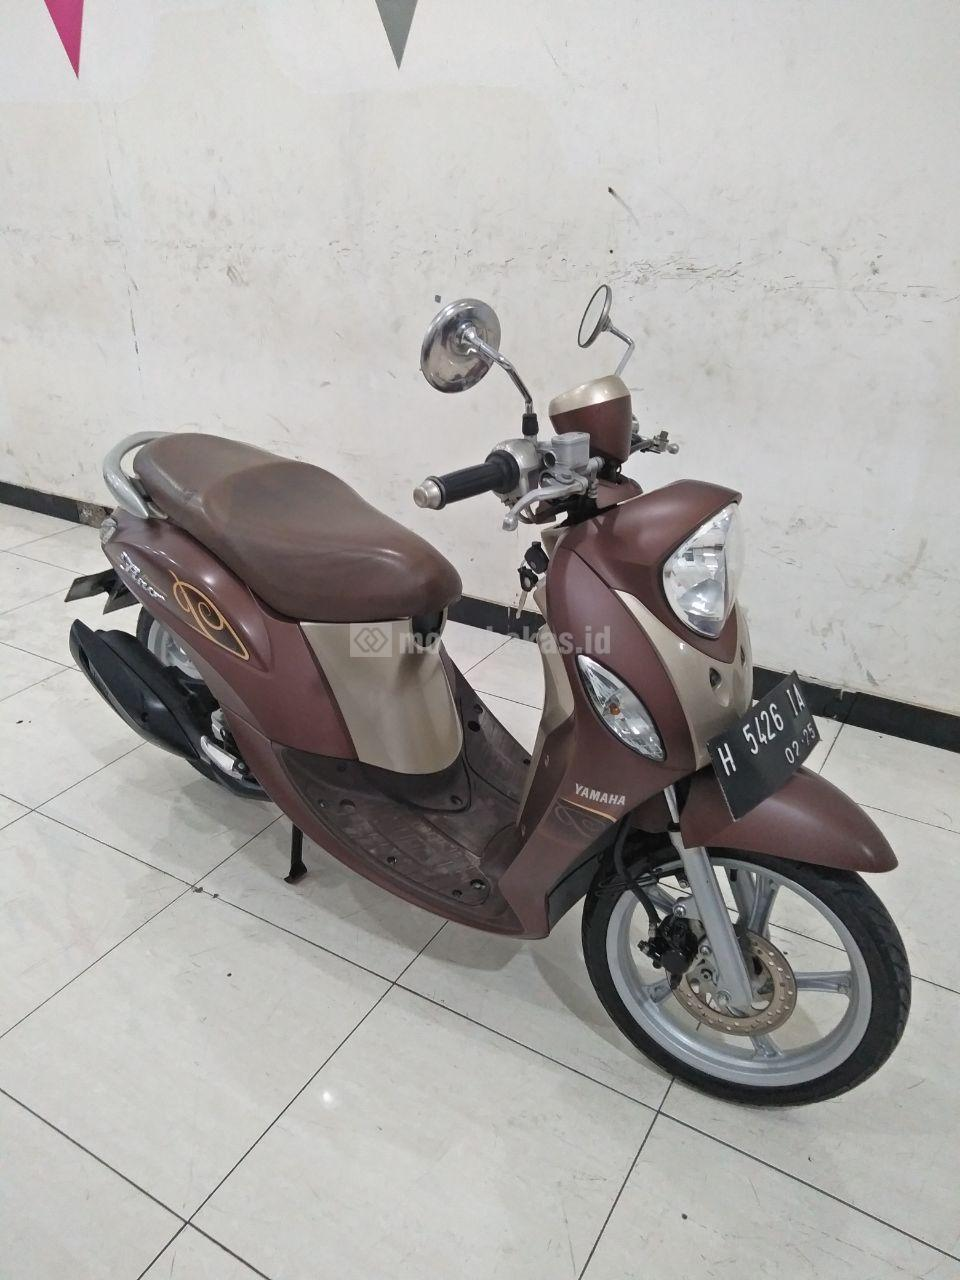 YAMAHA FINO PREMIUM  3163 motorbekas.id